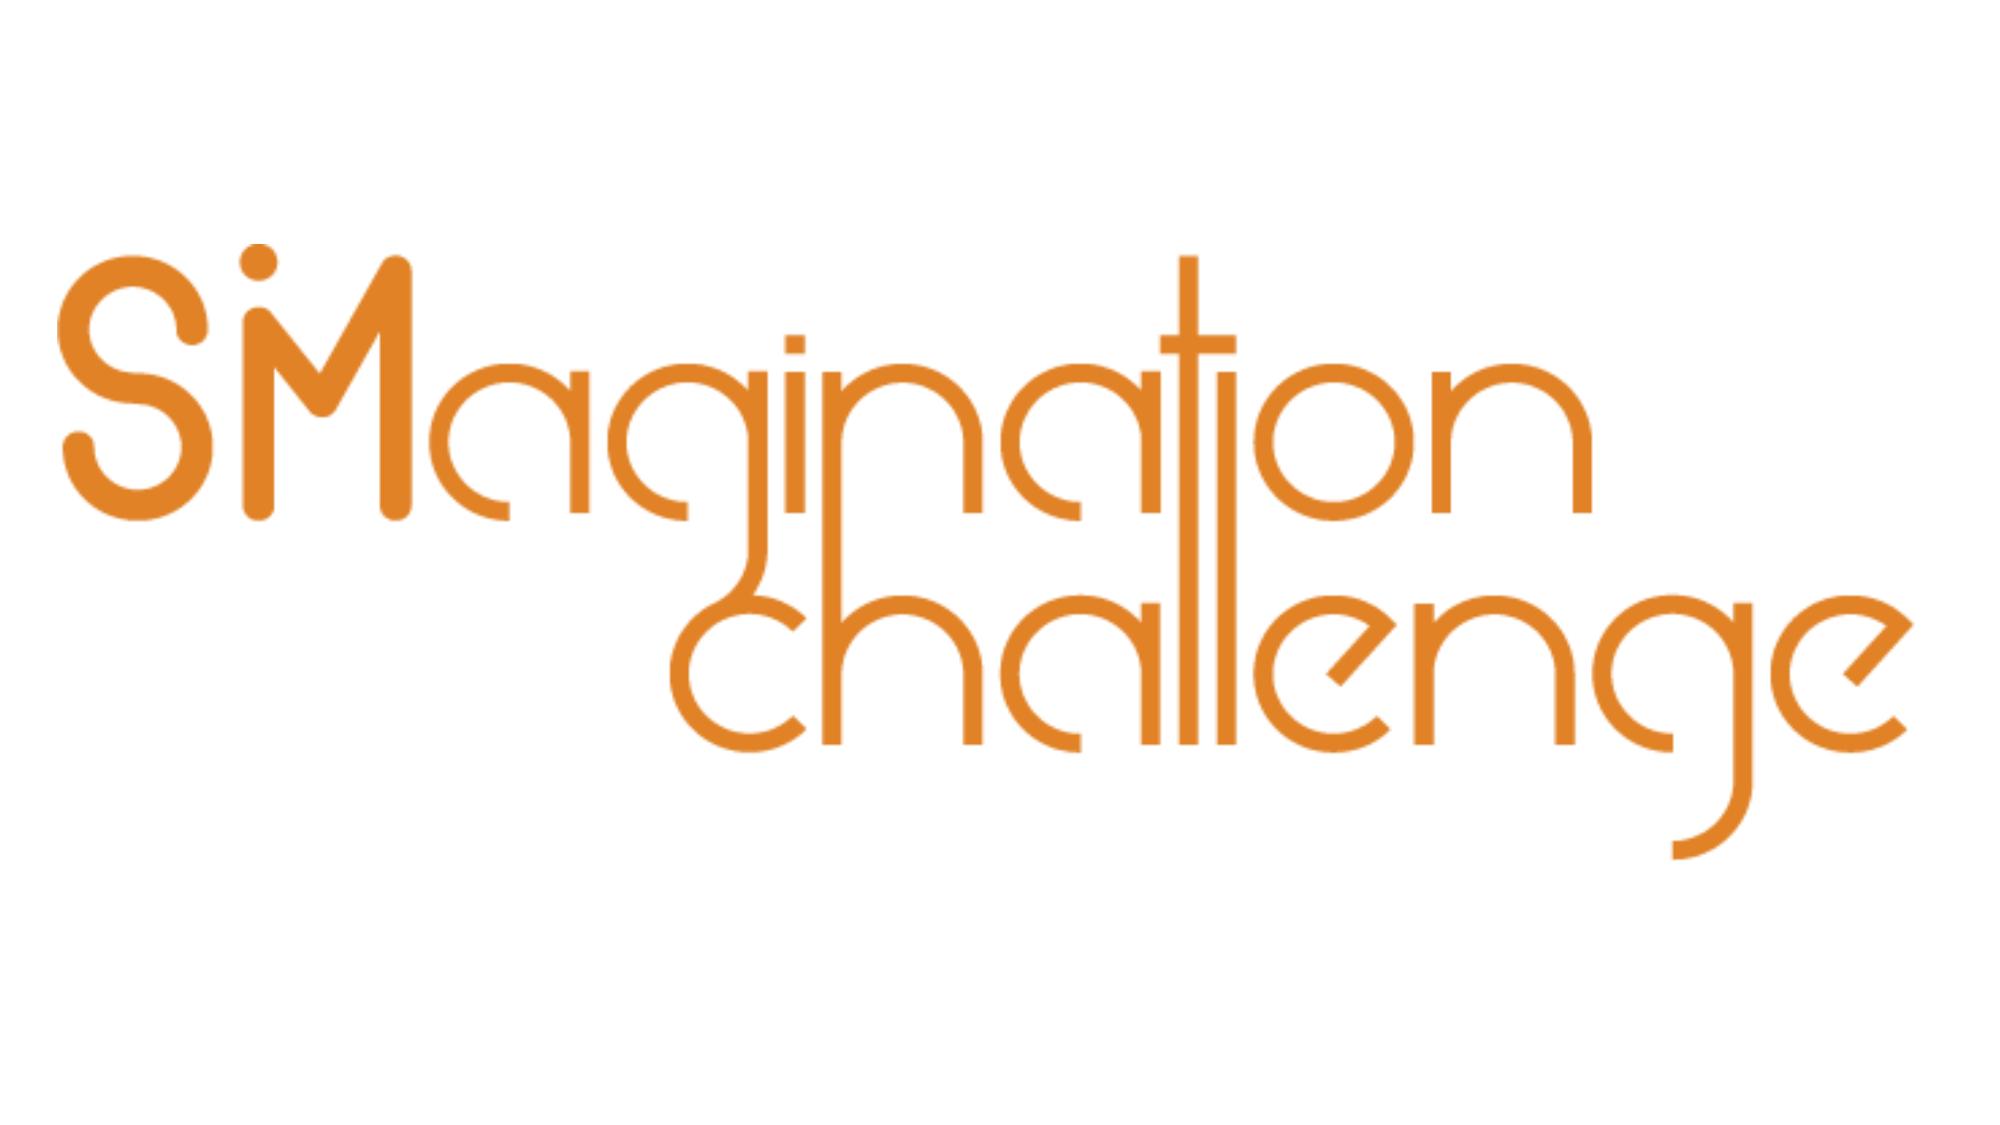 SIMagination Challenge